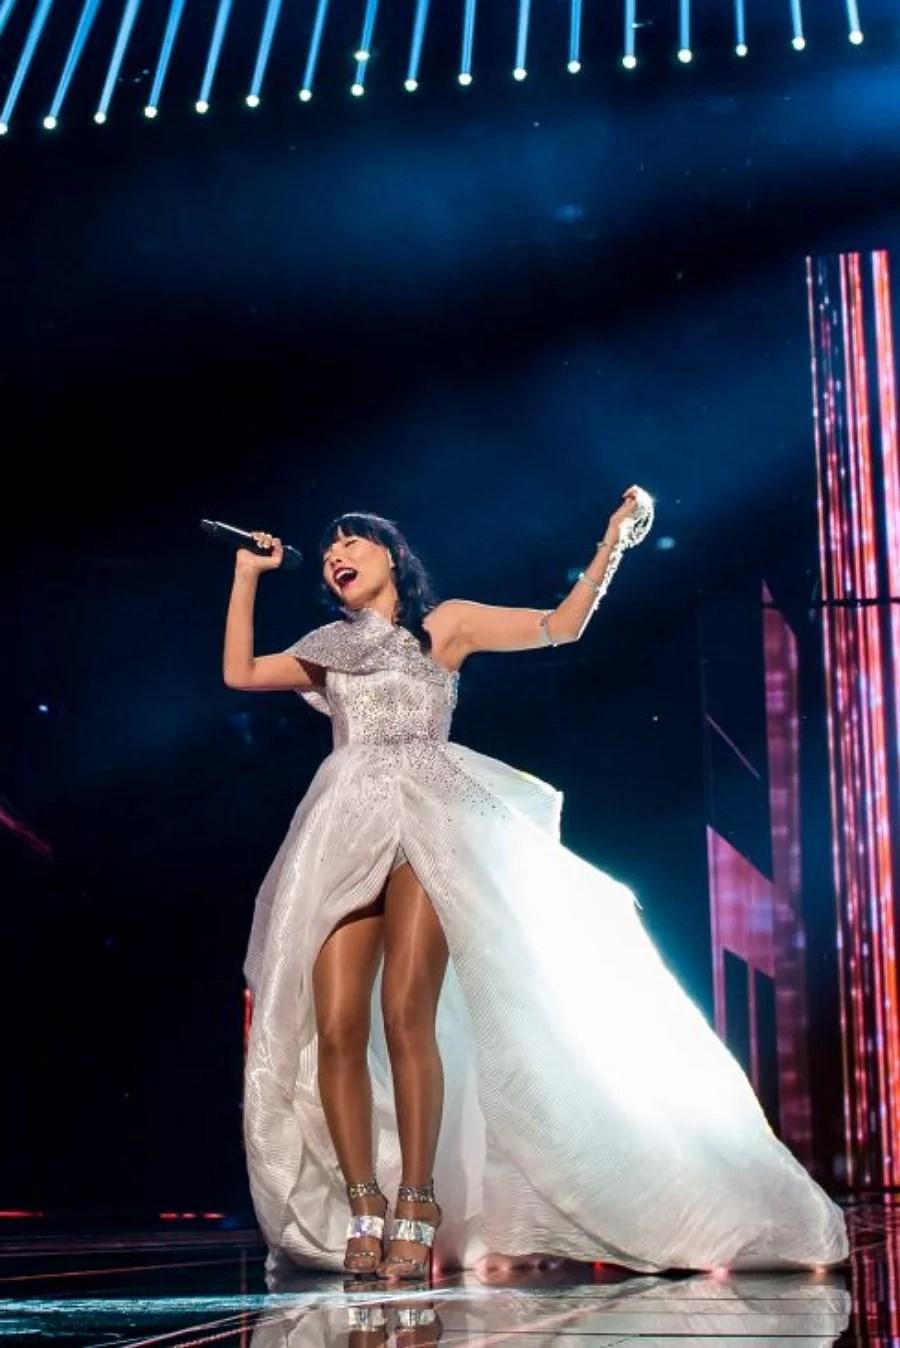 Eurovision Song Contest 2016: Australia